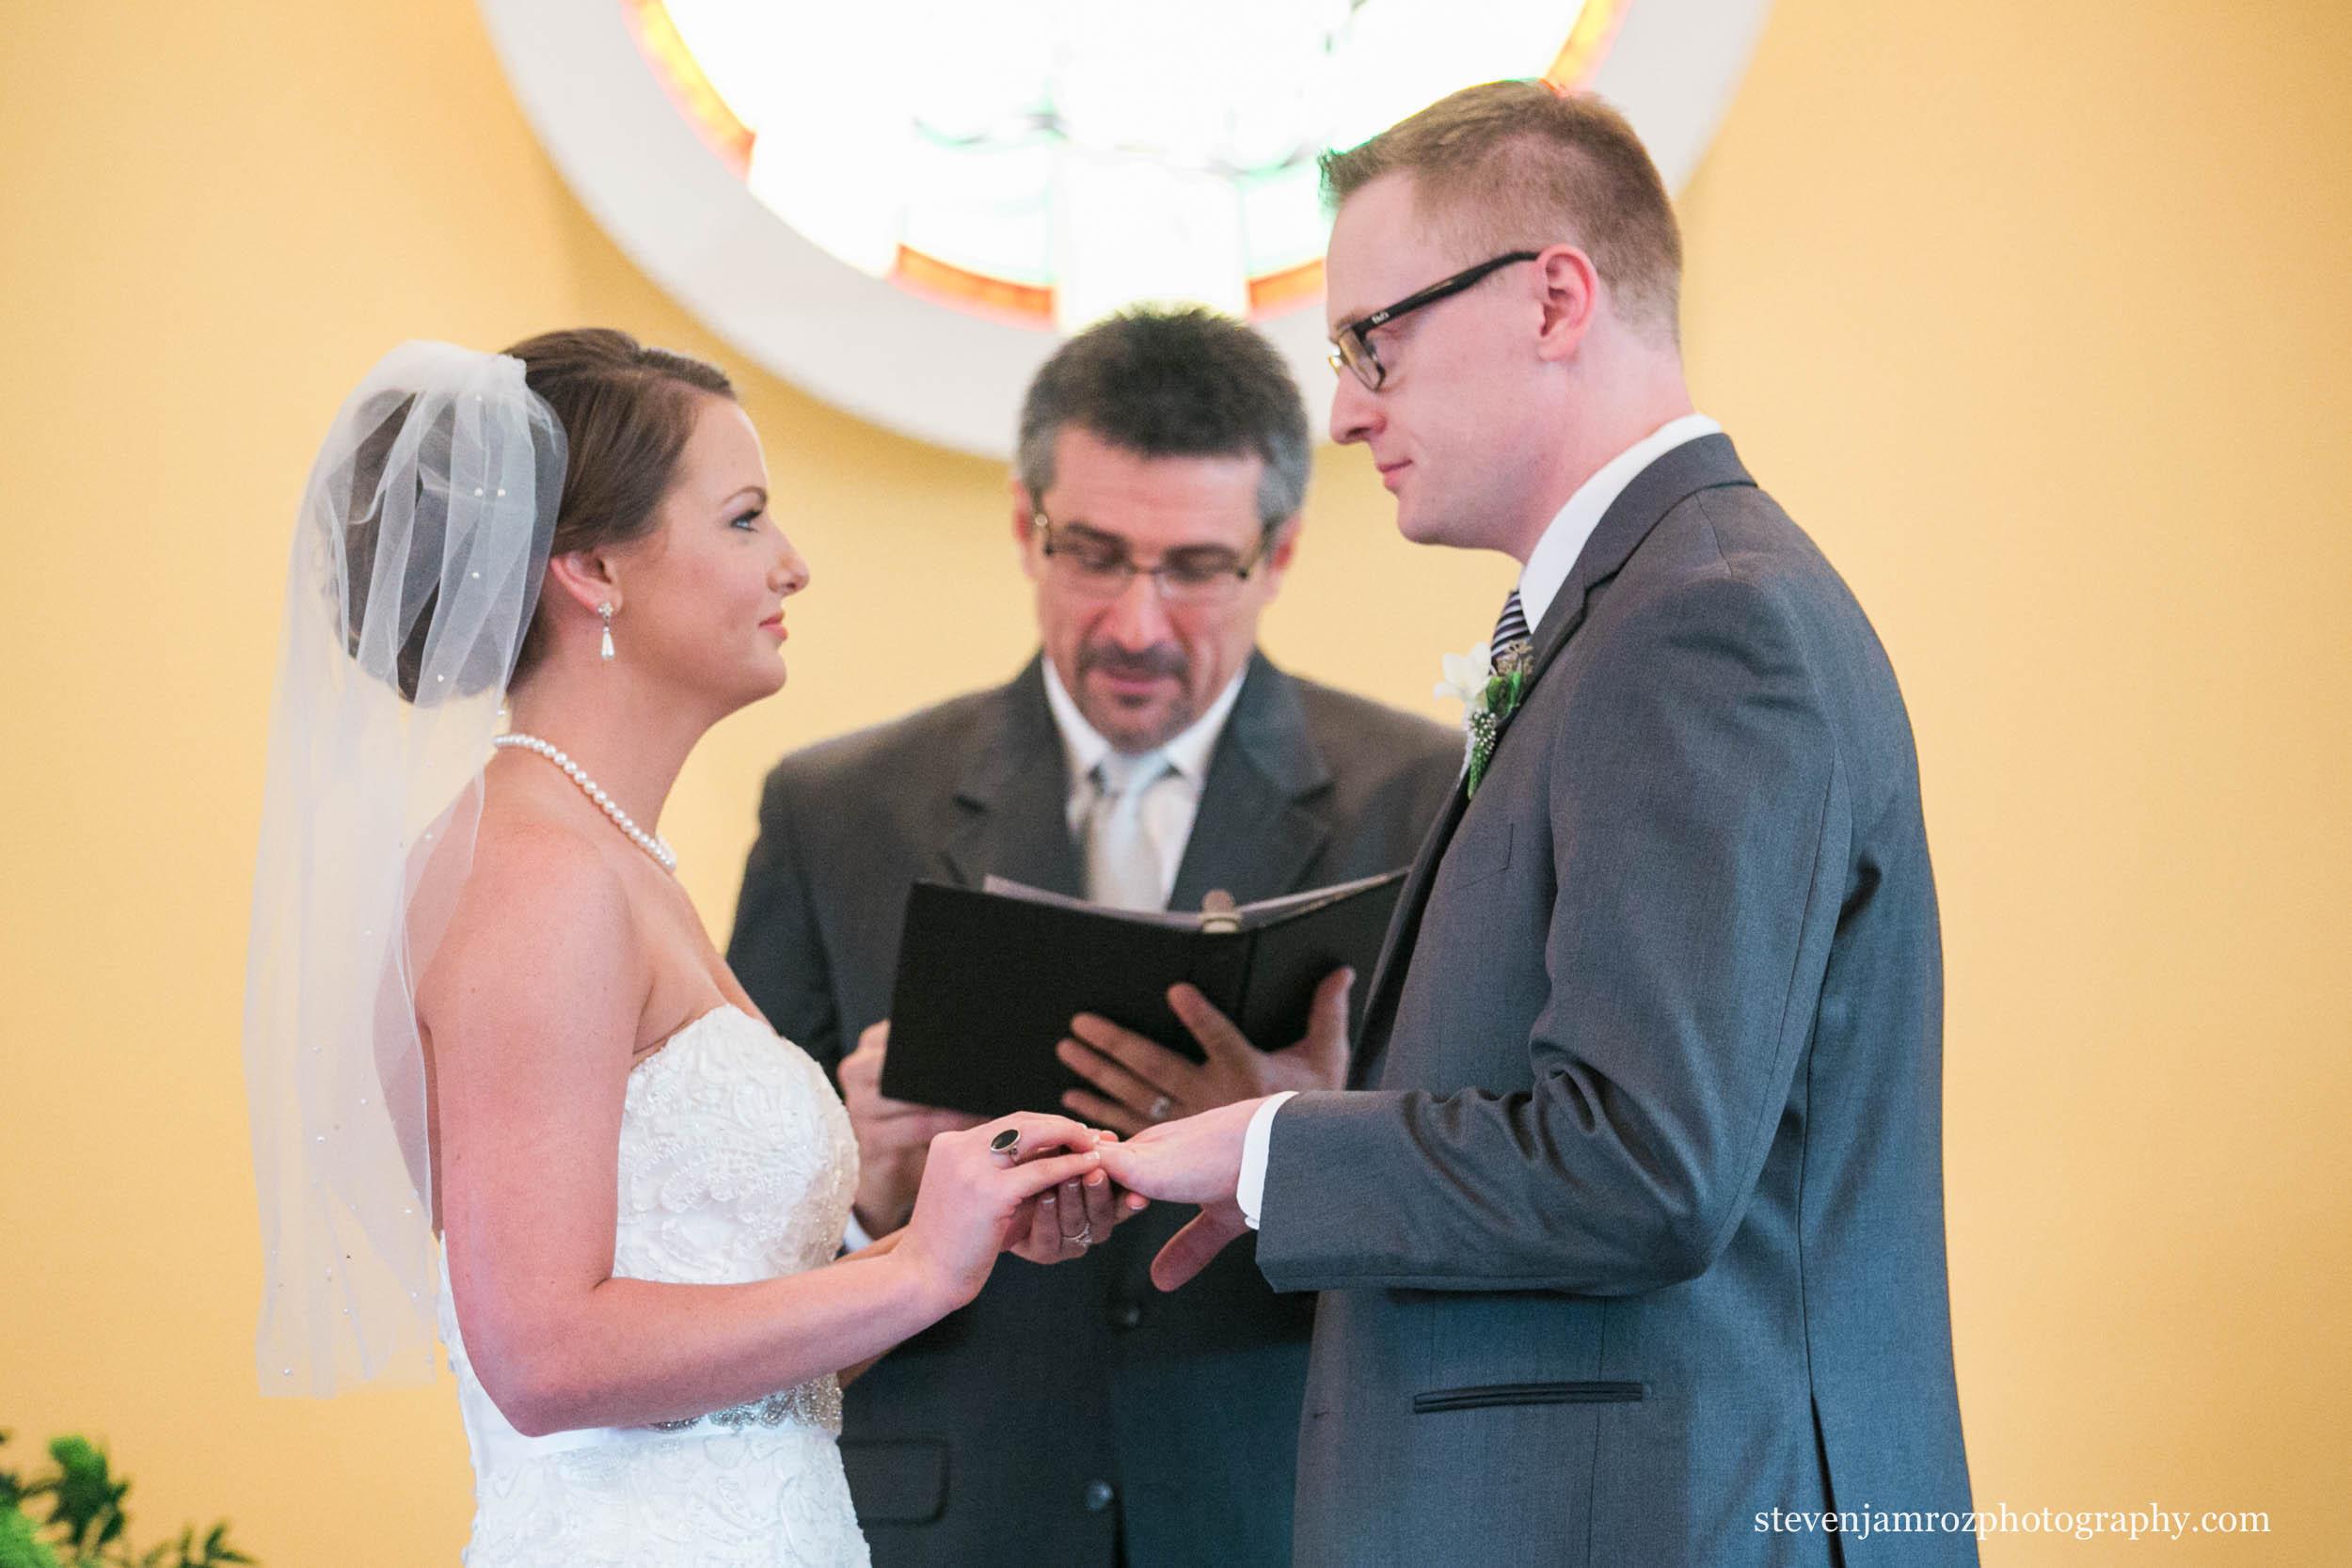 hudson-manor-wedding-chapel-ceremony-steven-jamroz-photography-0625.jpg